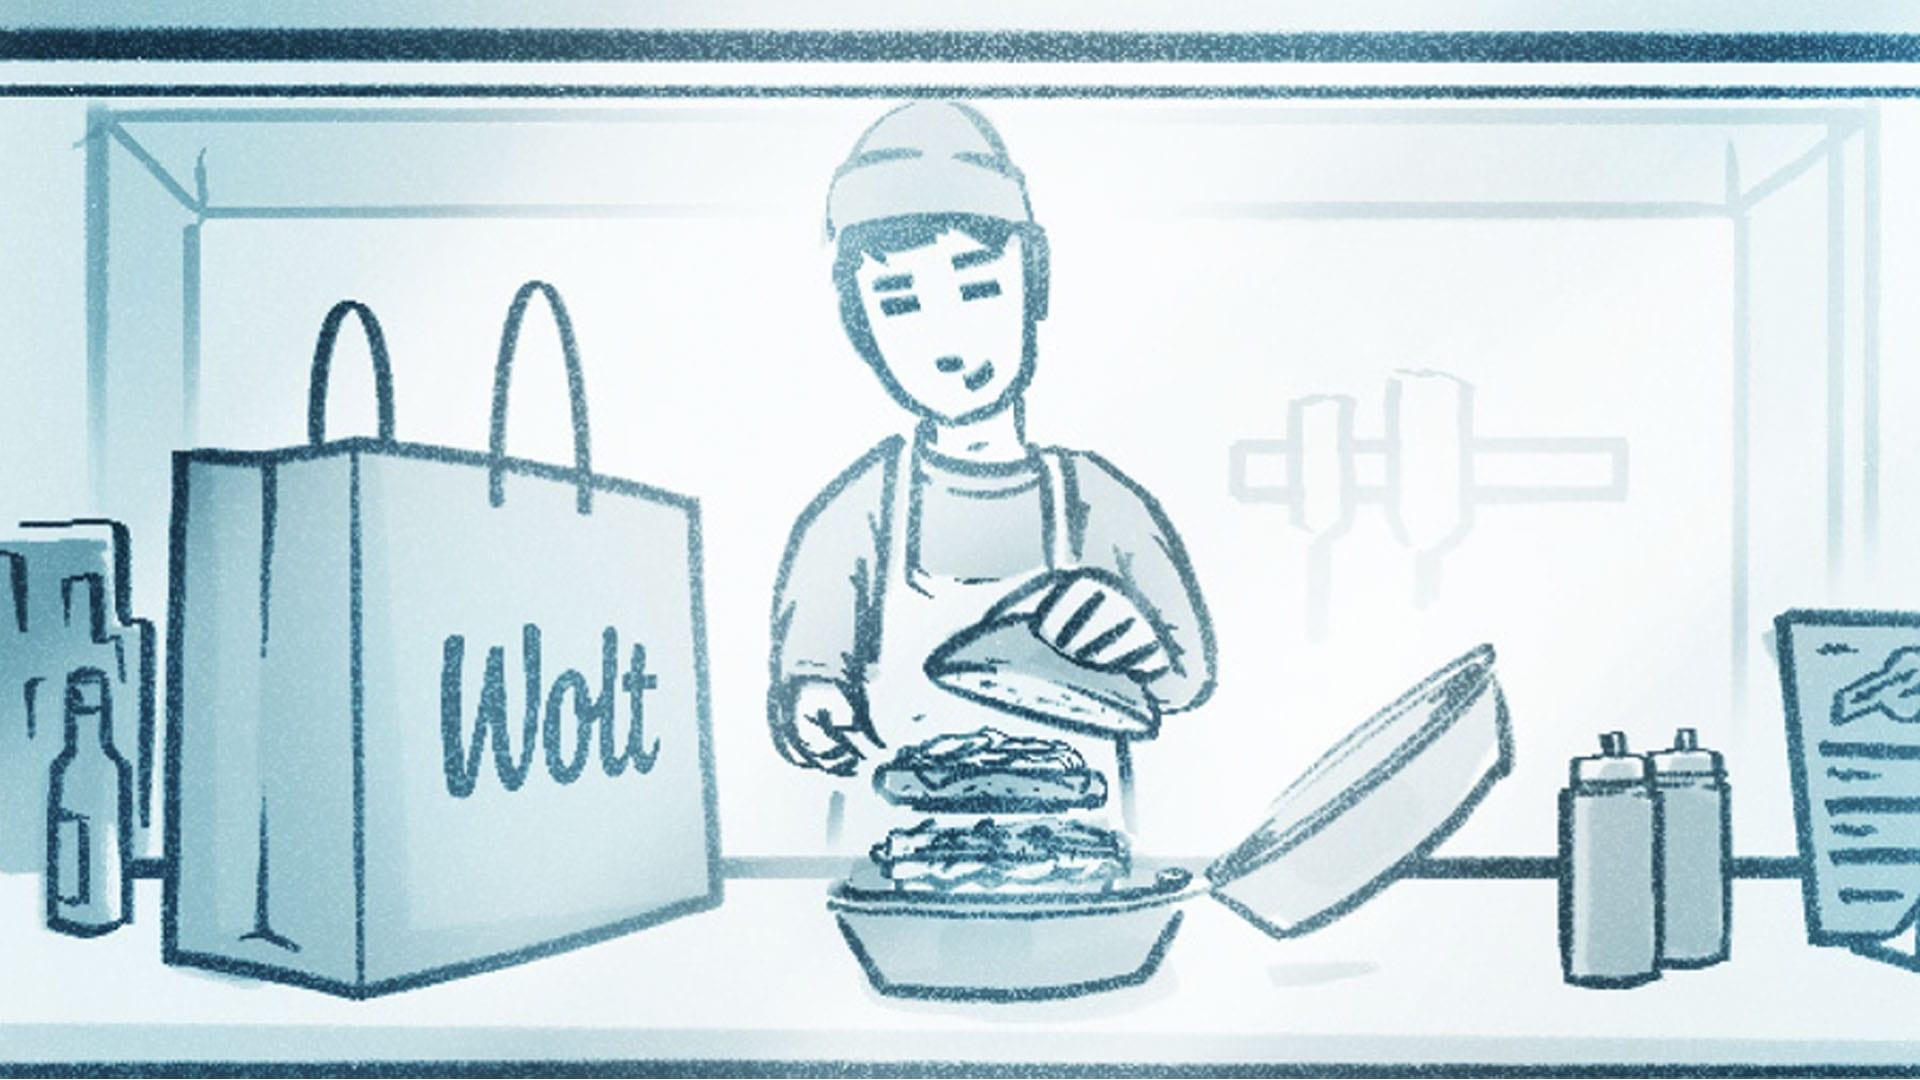 Wolt_choosing_storyboard_05